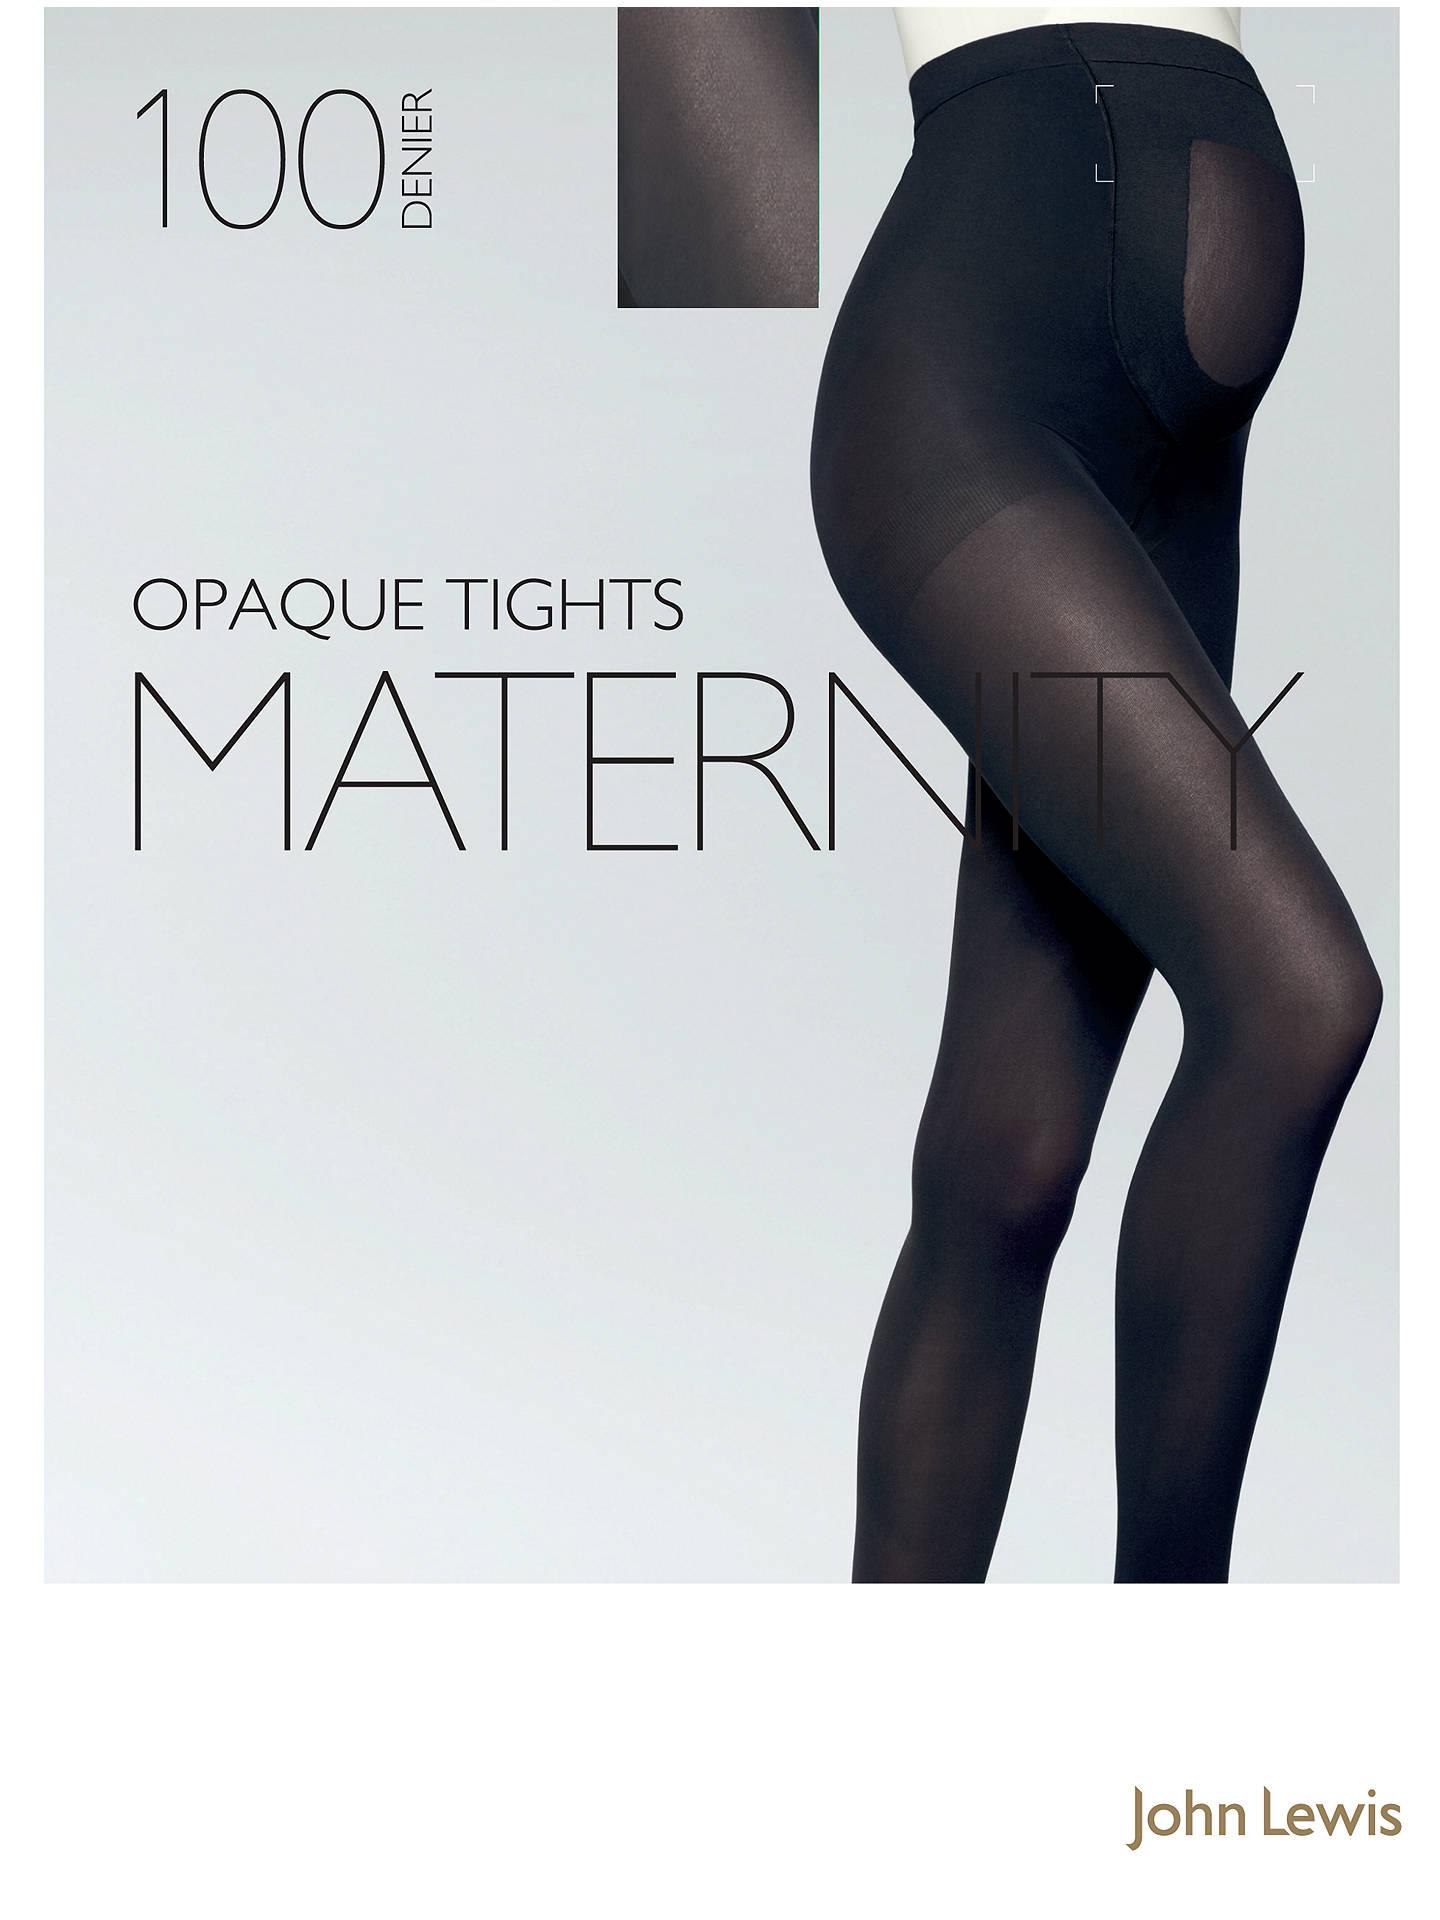 ec66f3d240d38 Buy John Lewis 100 Denier Opaque Maternity Tights, Black, M Online at  johnlewis.